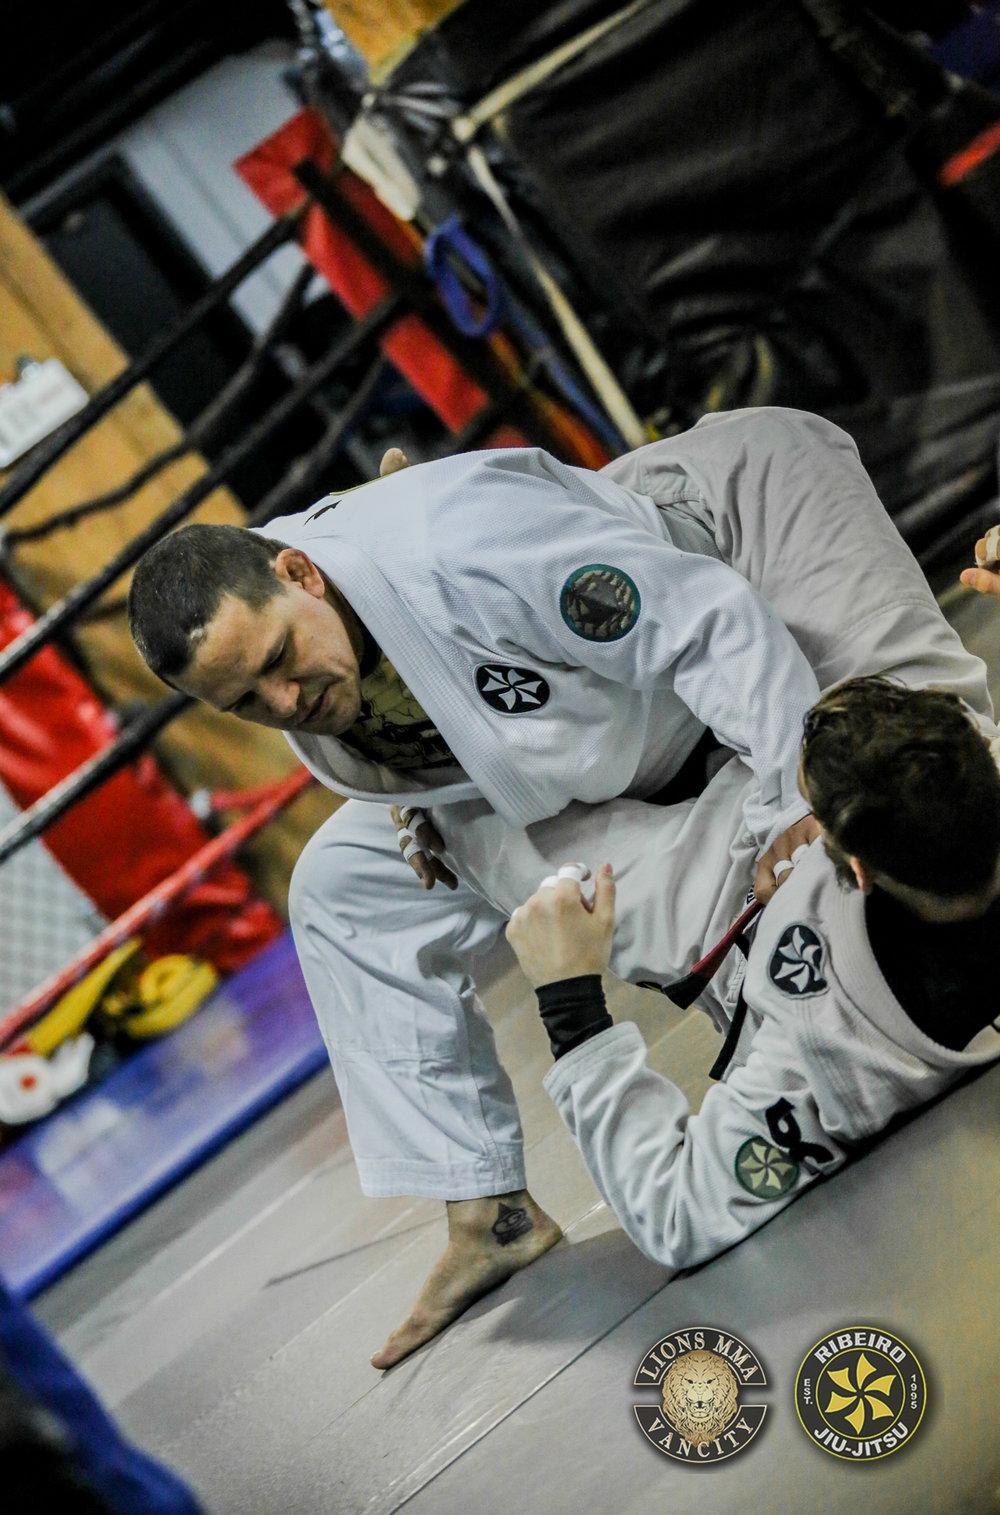 LIONS MMA - RIBEIRO JUI-JITSU  - SOMBILON PHOTOGRAPHY-73.jpg